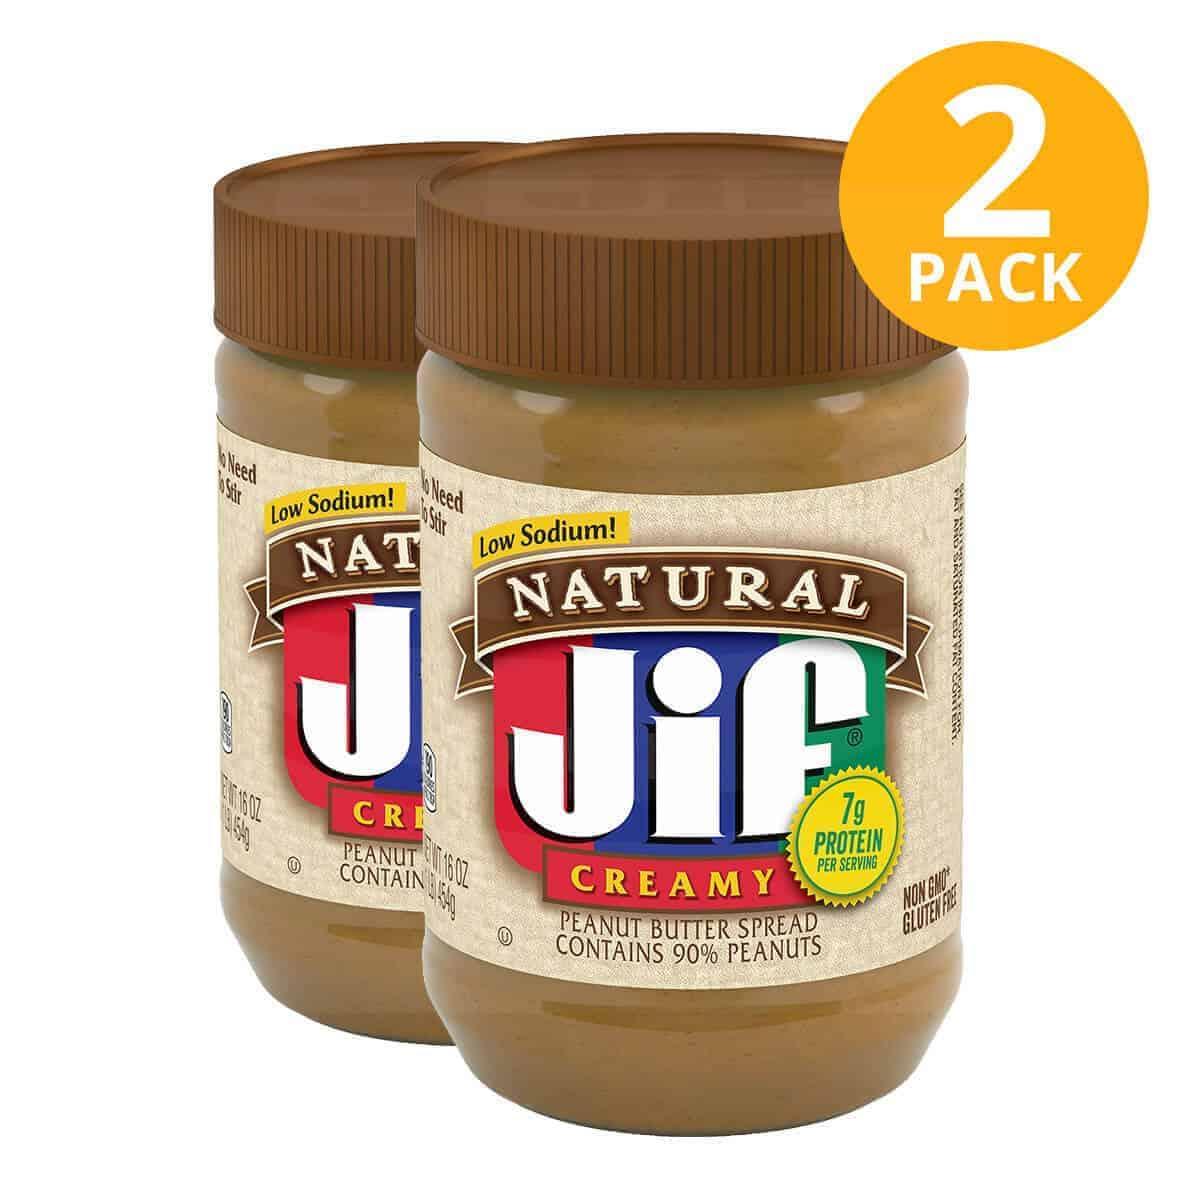 Jif Natural Peanut Butter